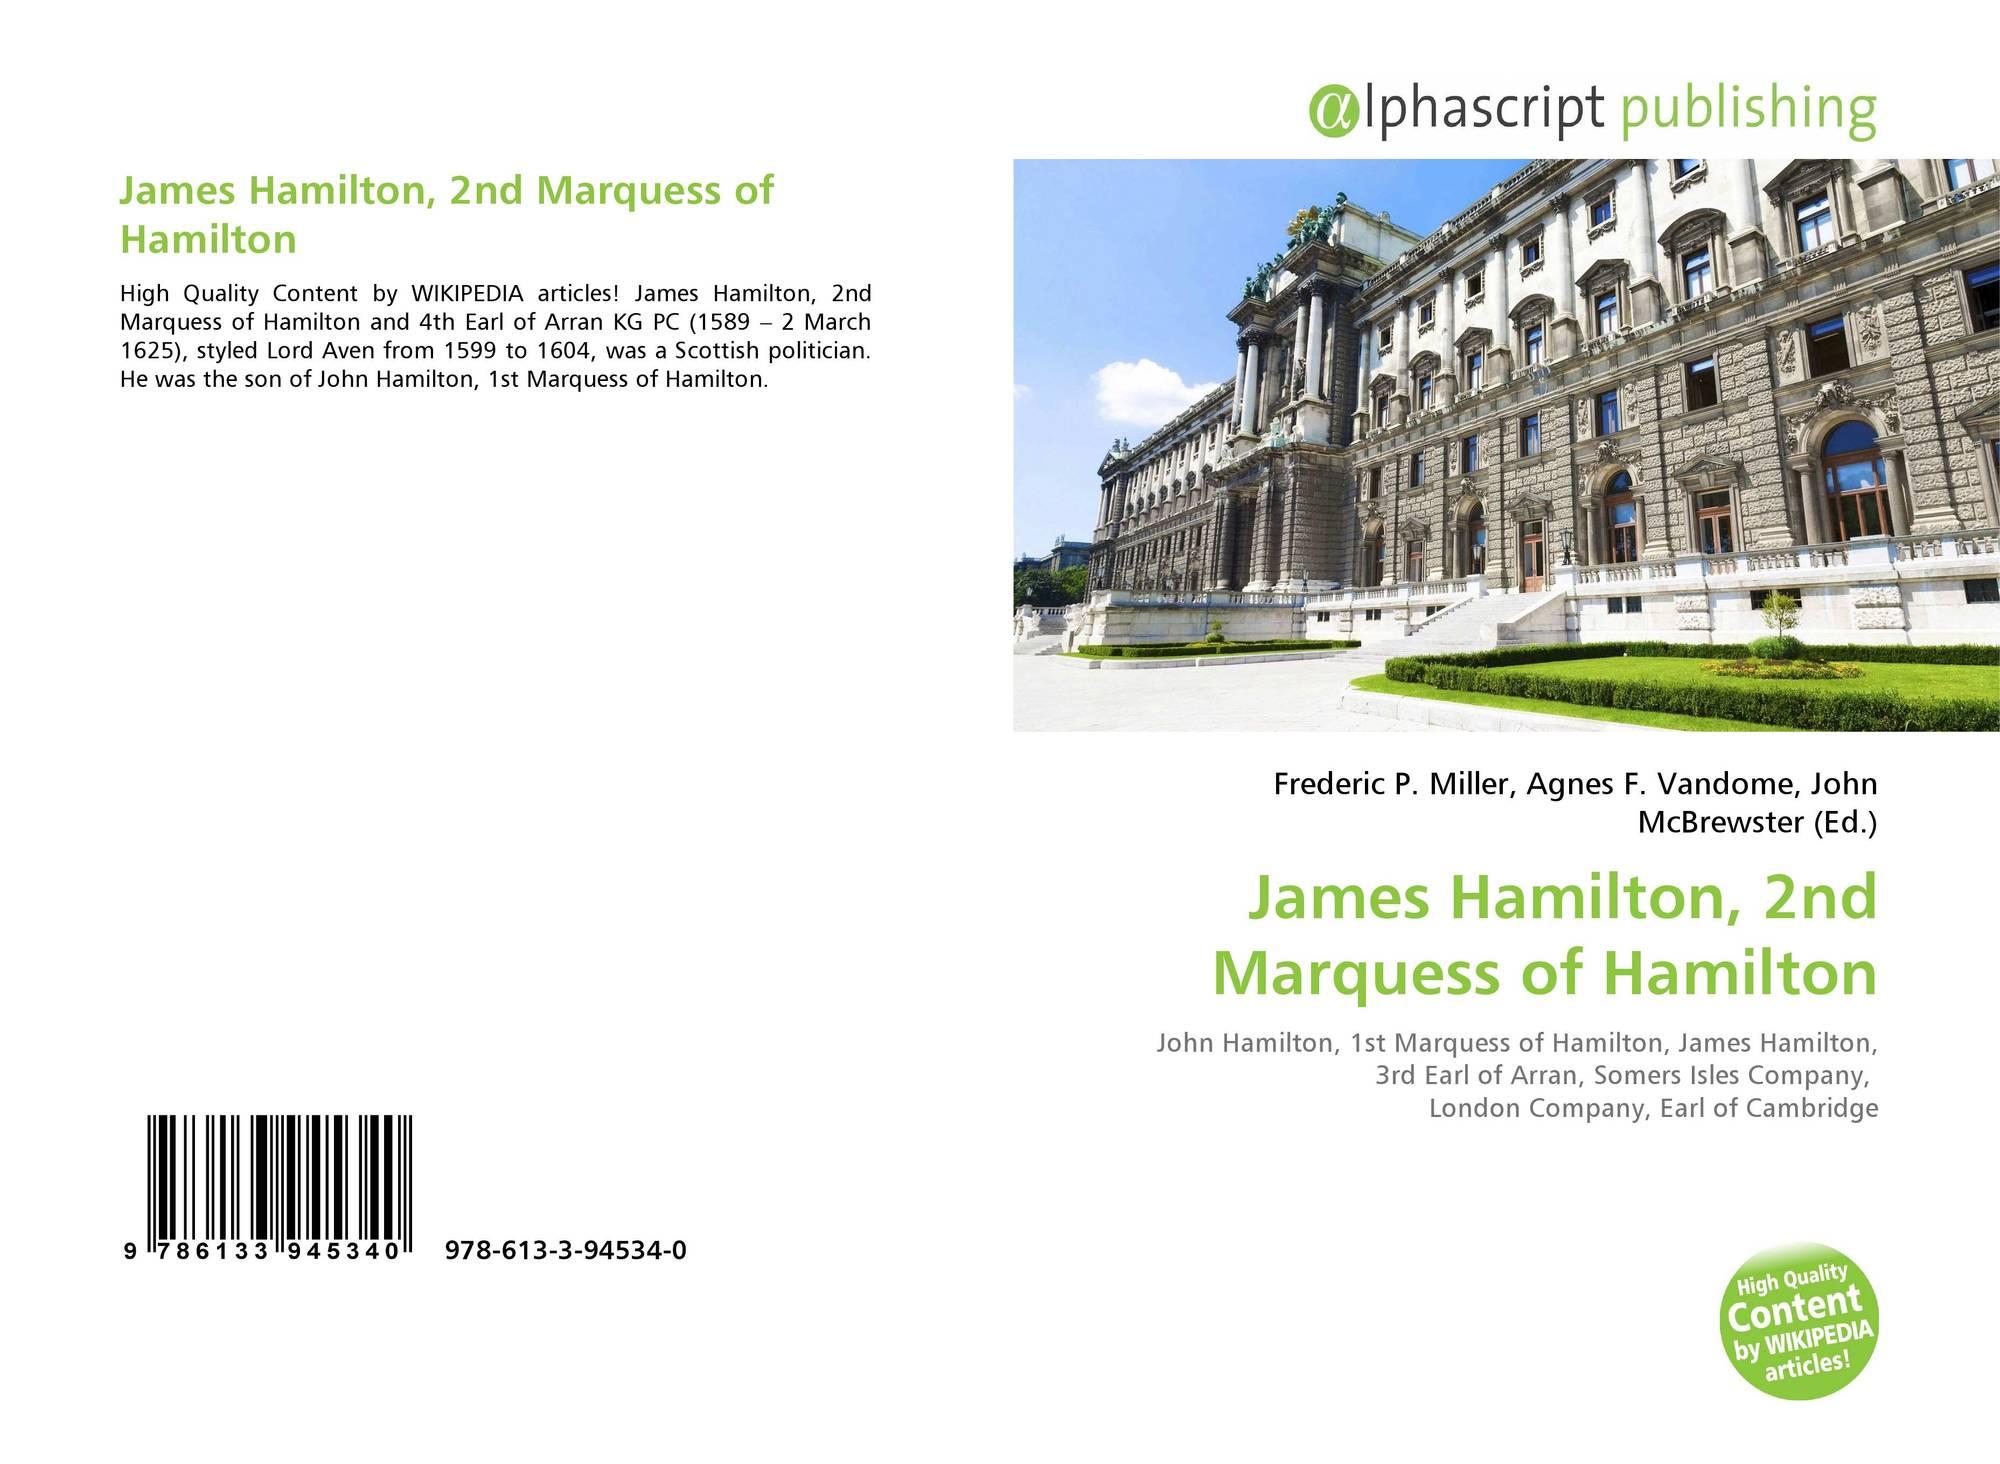 James Hamilton, 3rd Earl of Arran